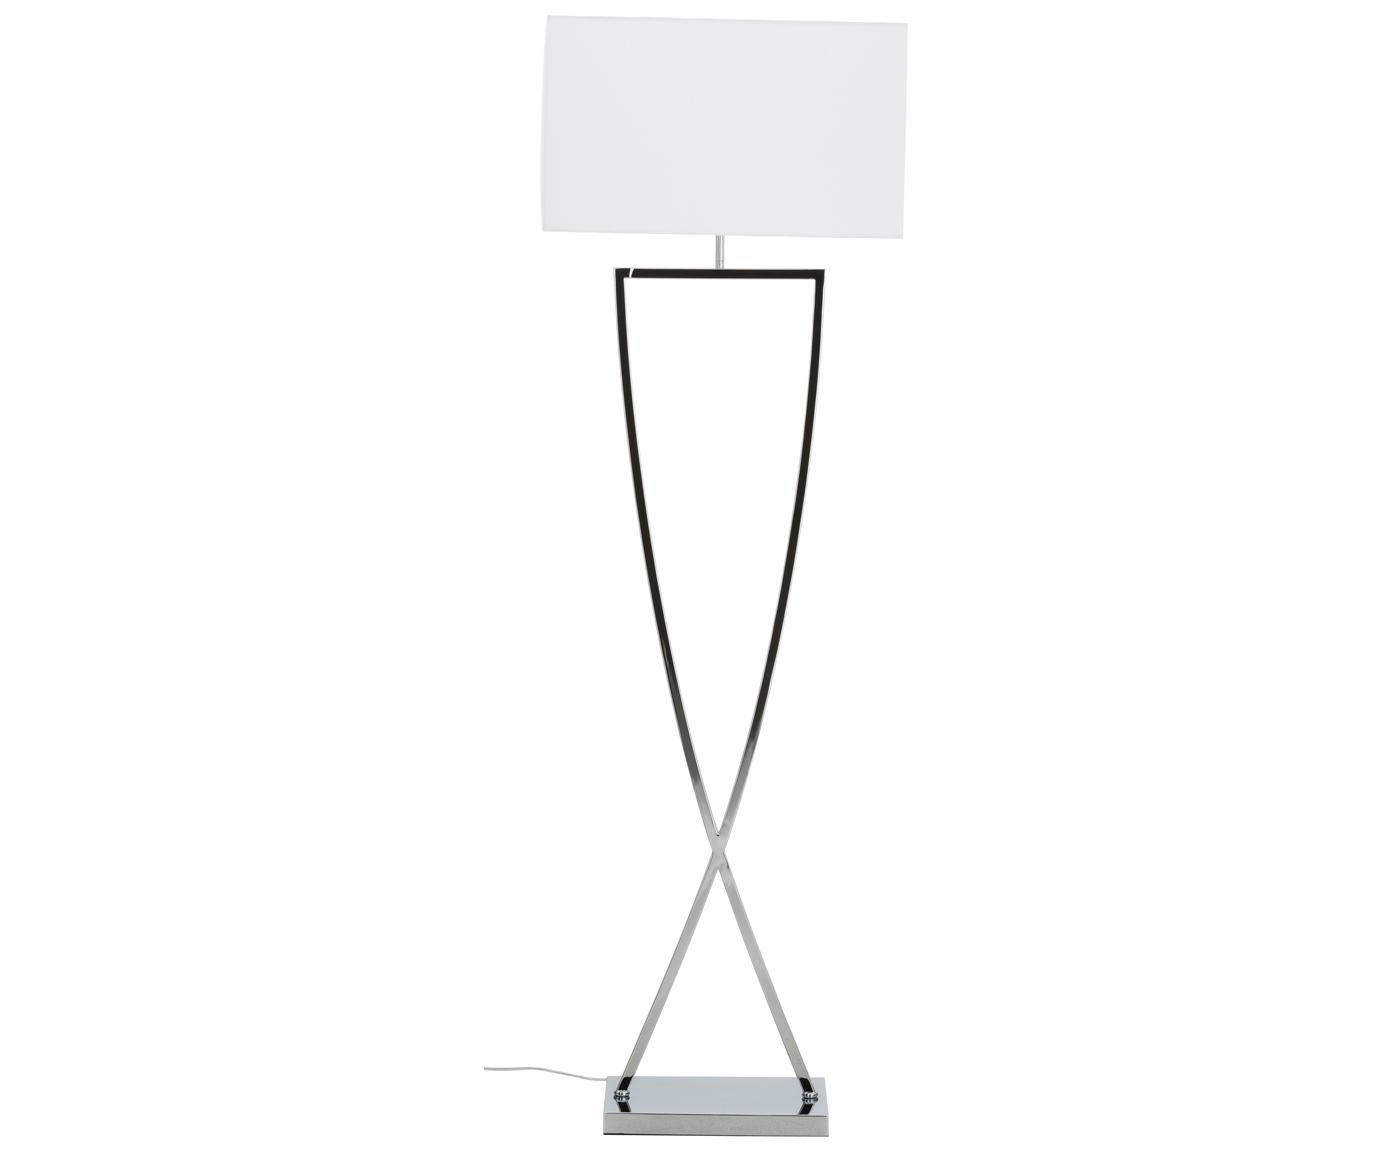 Vloerlamp Toulouse in zilverkleur, Lampvoet: verchroomd metaal, Lampenkap: textiel, Chroomkleurig, wit, 50 x 157 cm